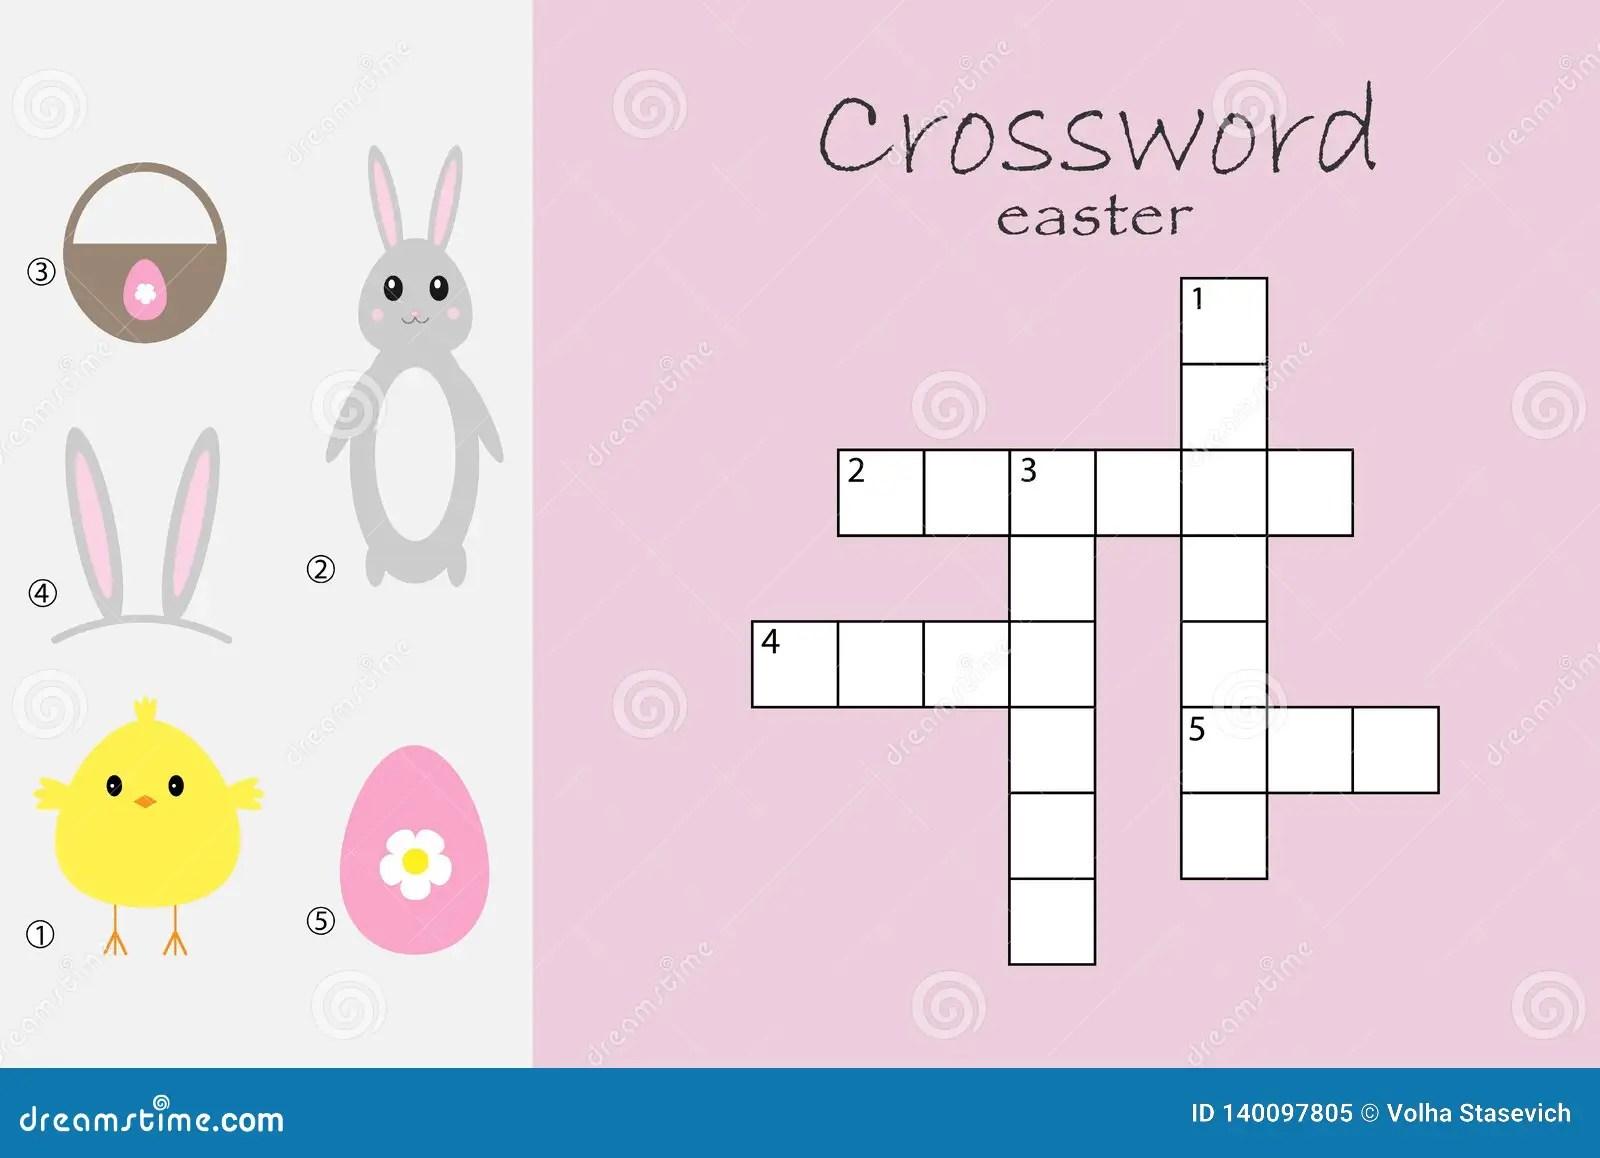 Rossword For Children Easter Theme Fun Education Game